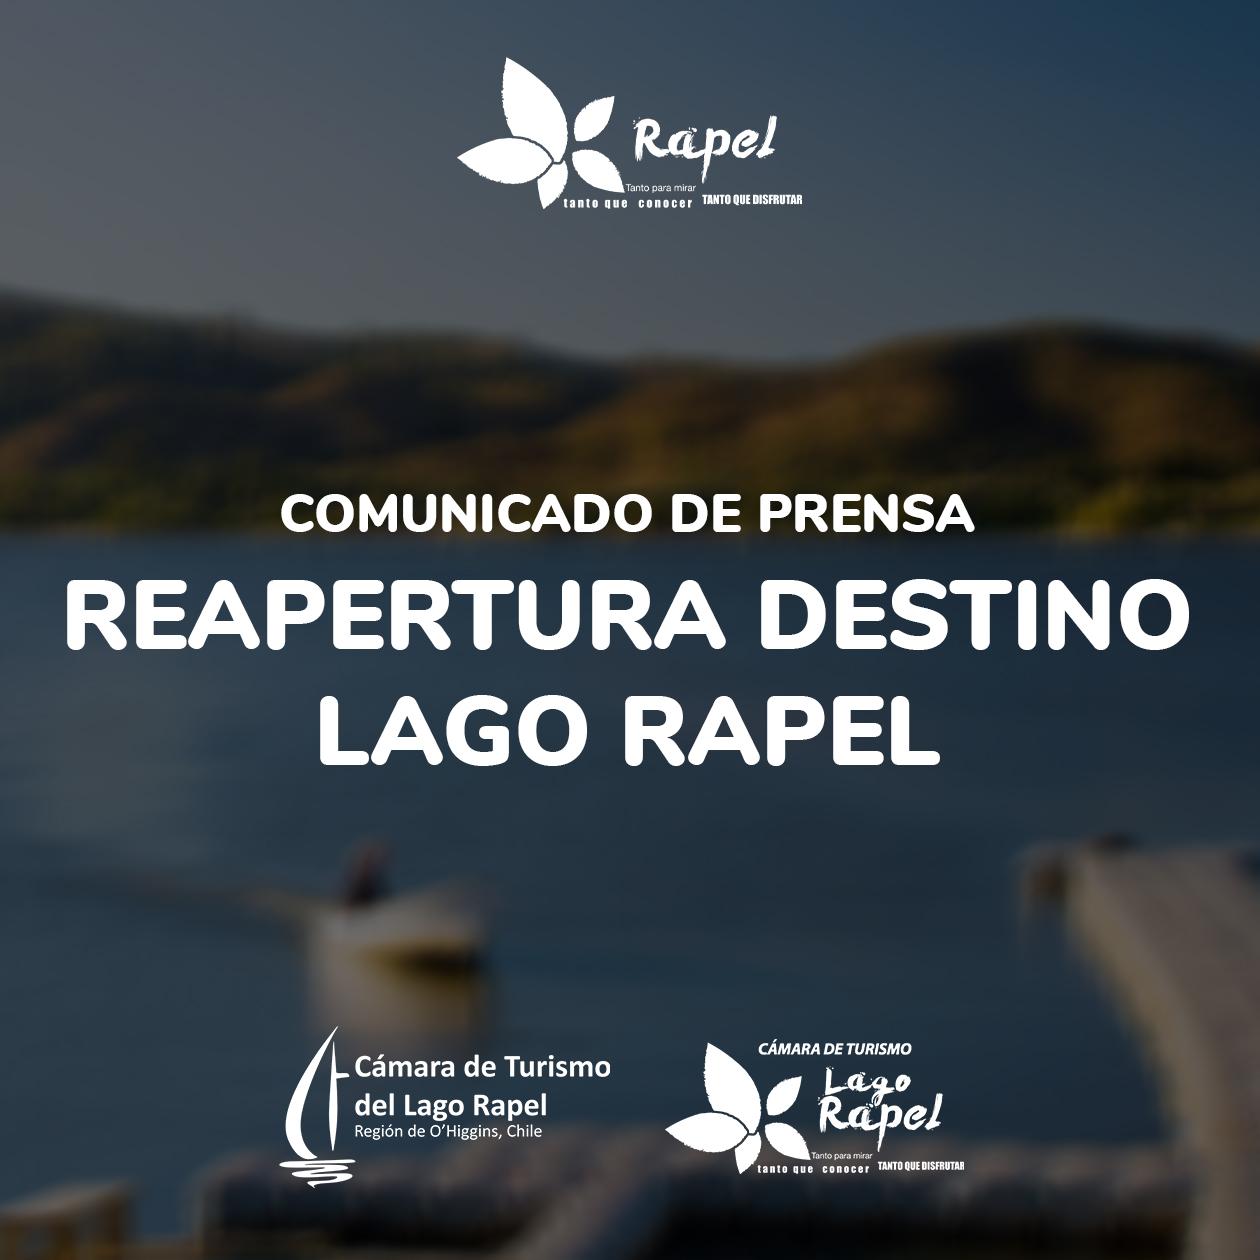 Fotografía de Comunicado Reapertura Destino Lago Rapel